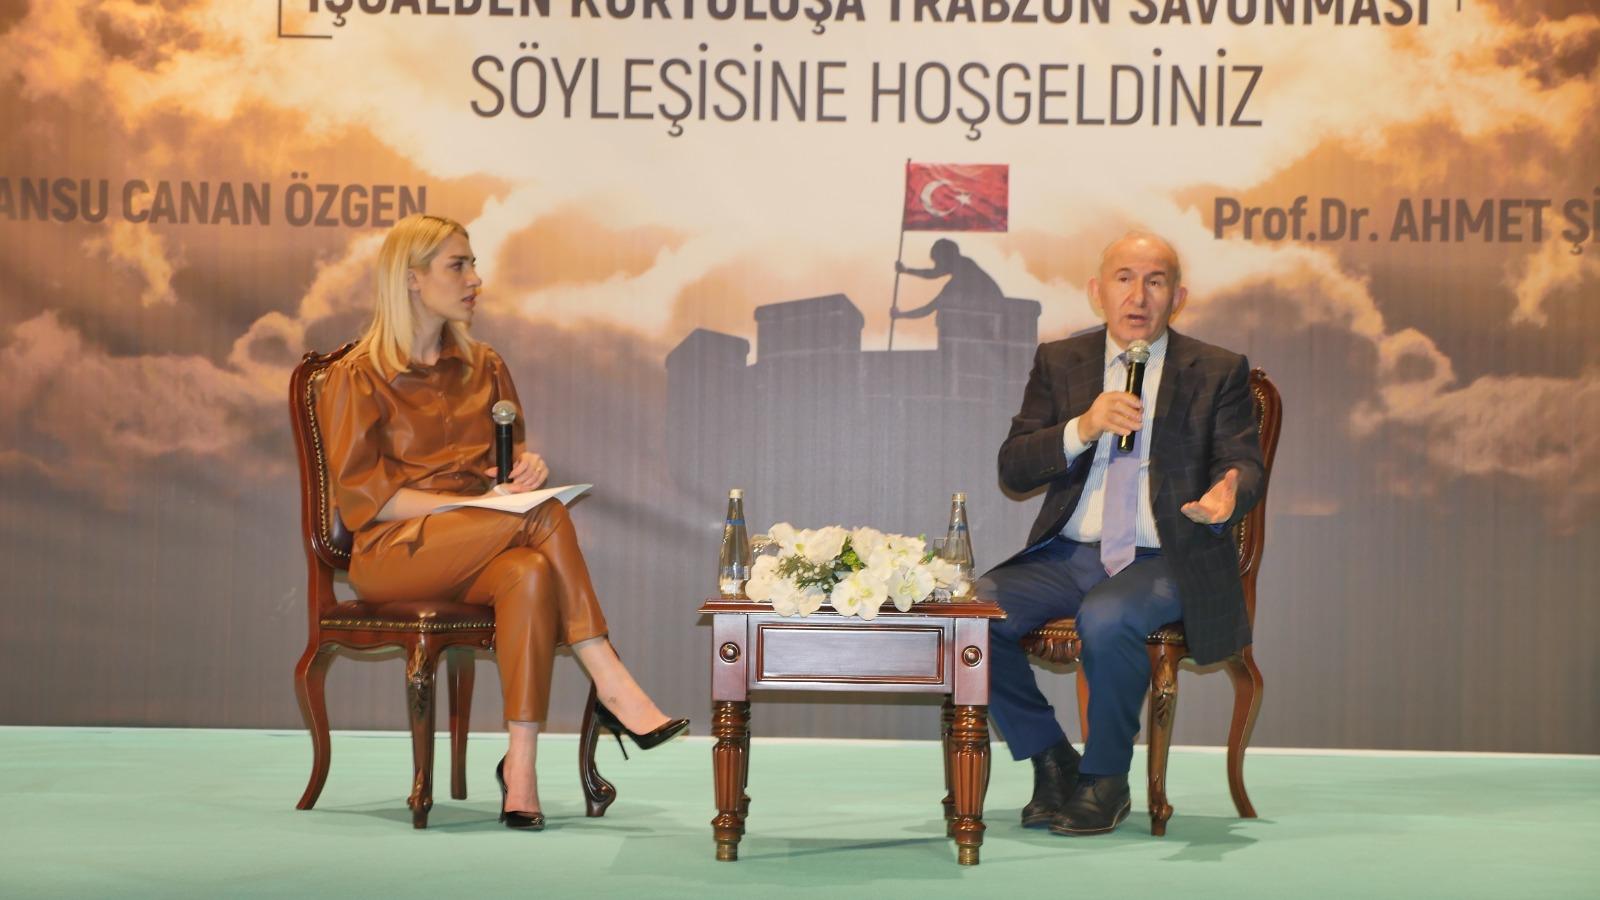 'İşgalden Kurtuluşa Trabzon Savunması' Konuşuldu